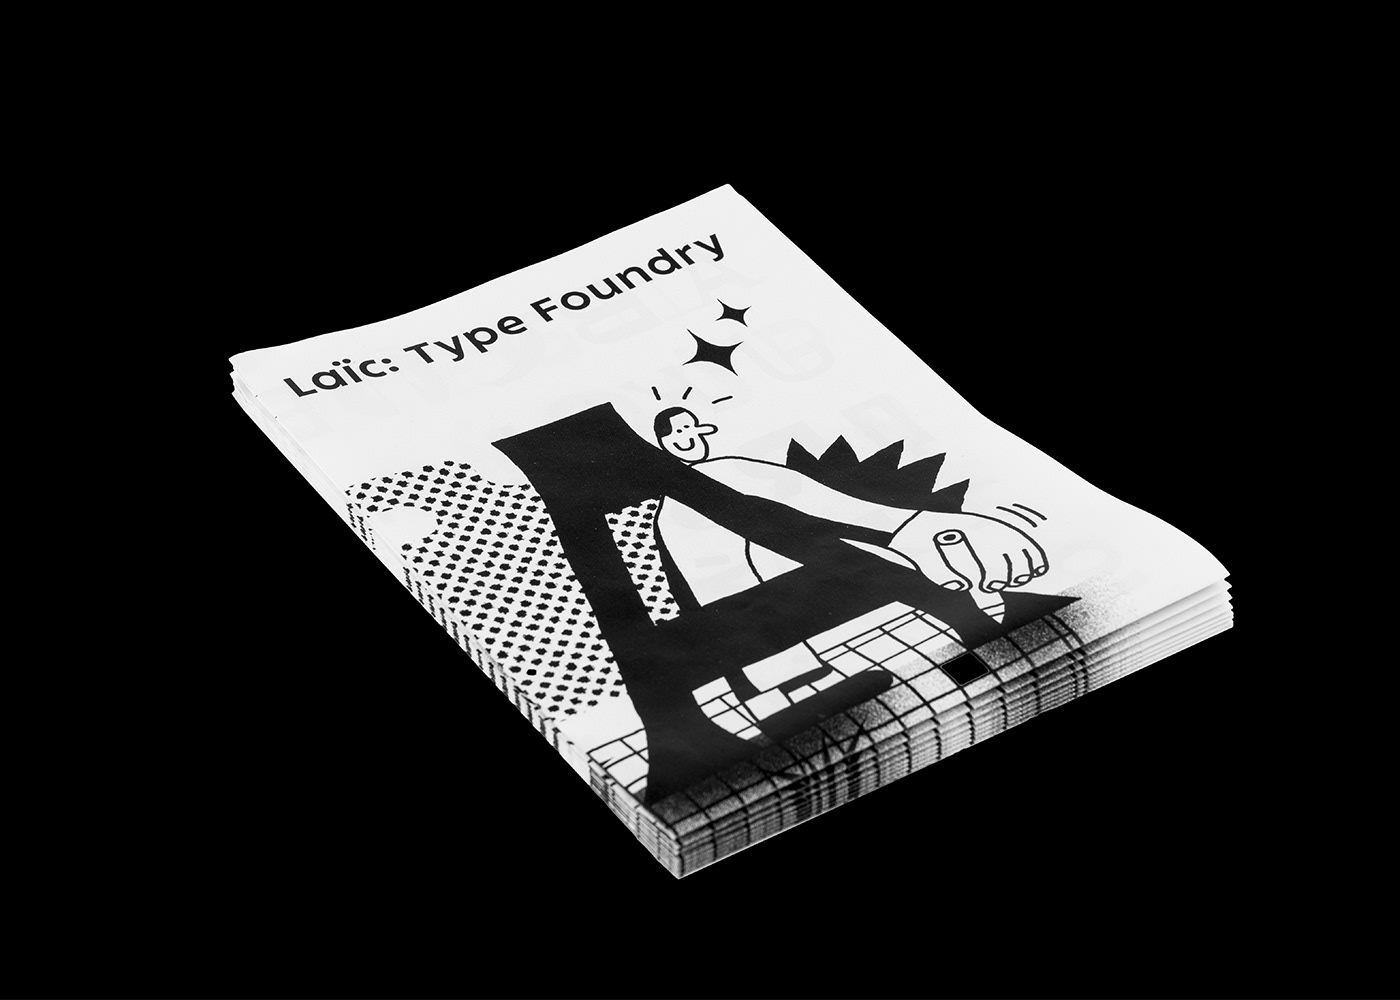 Laictype zgonowicz kamillach Drawing  letters typography   flyer printcontrol